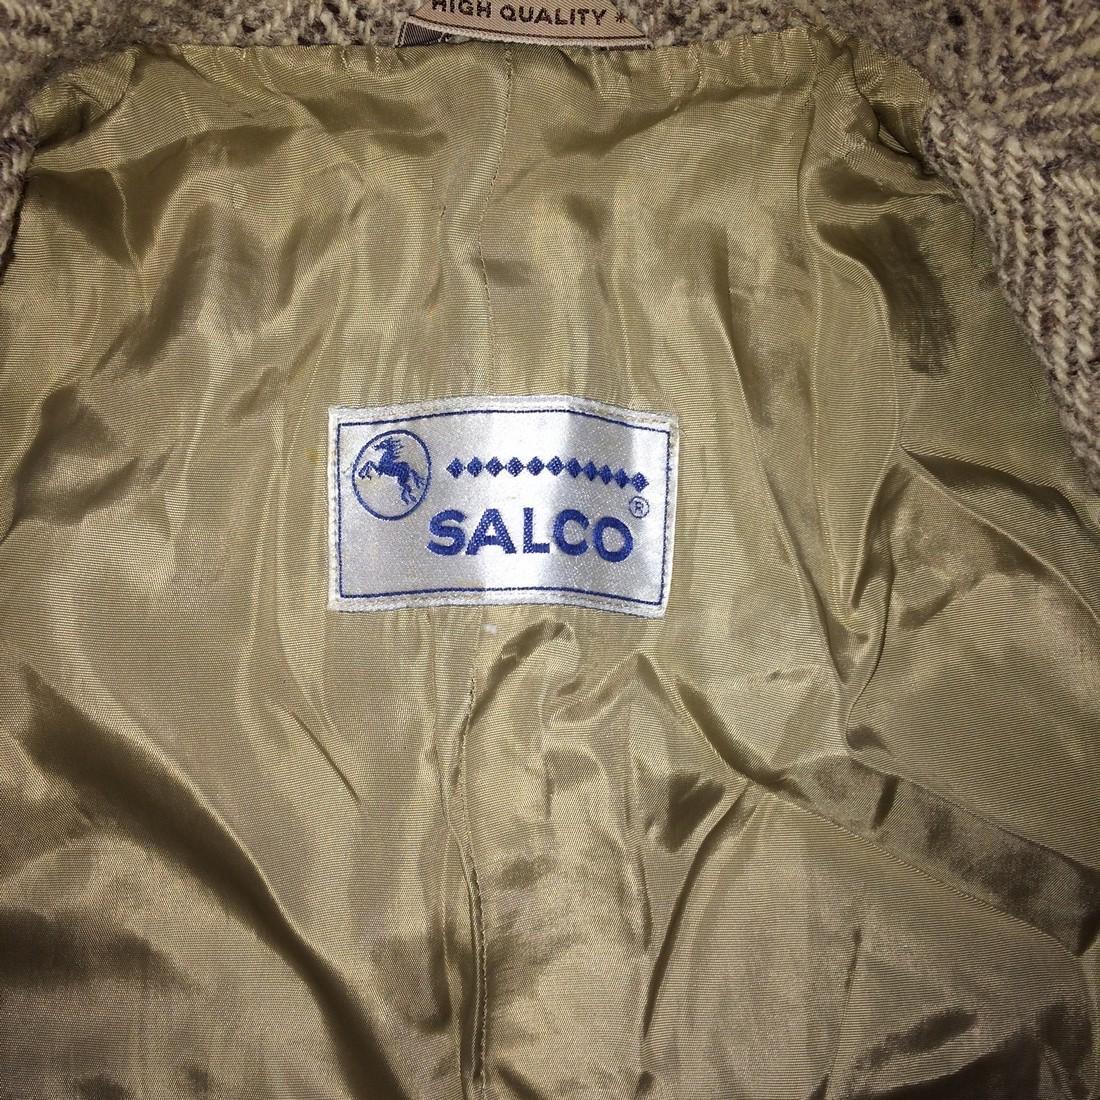 Women's Salco Pure New Wool Jacket Coat Size XL - 7